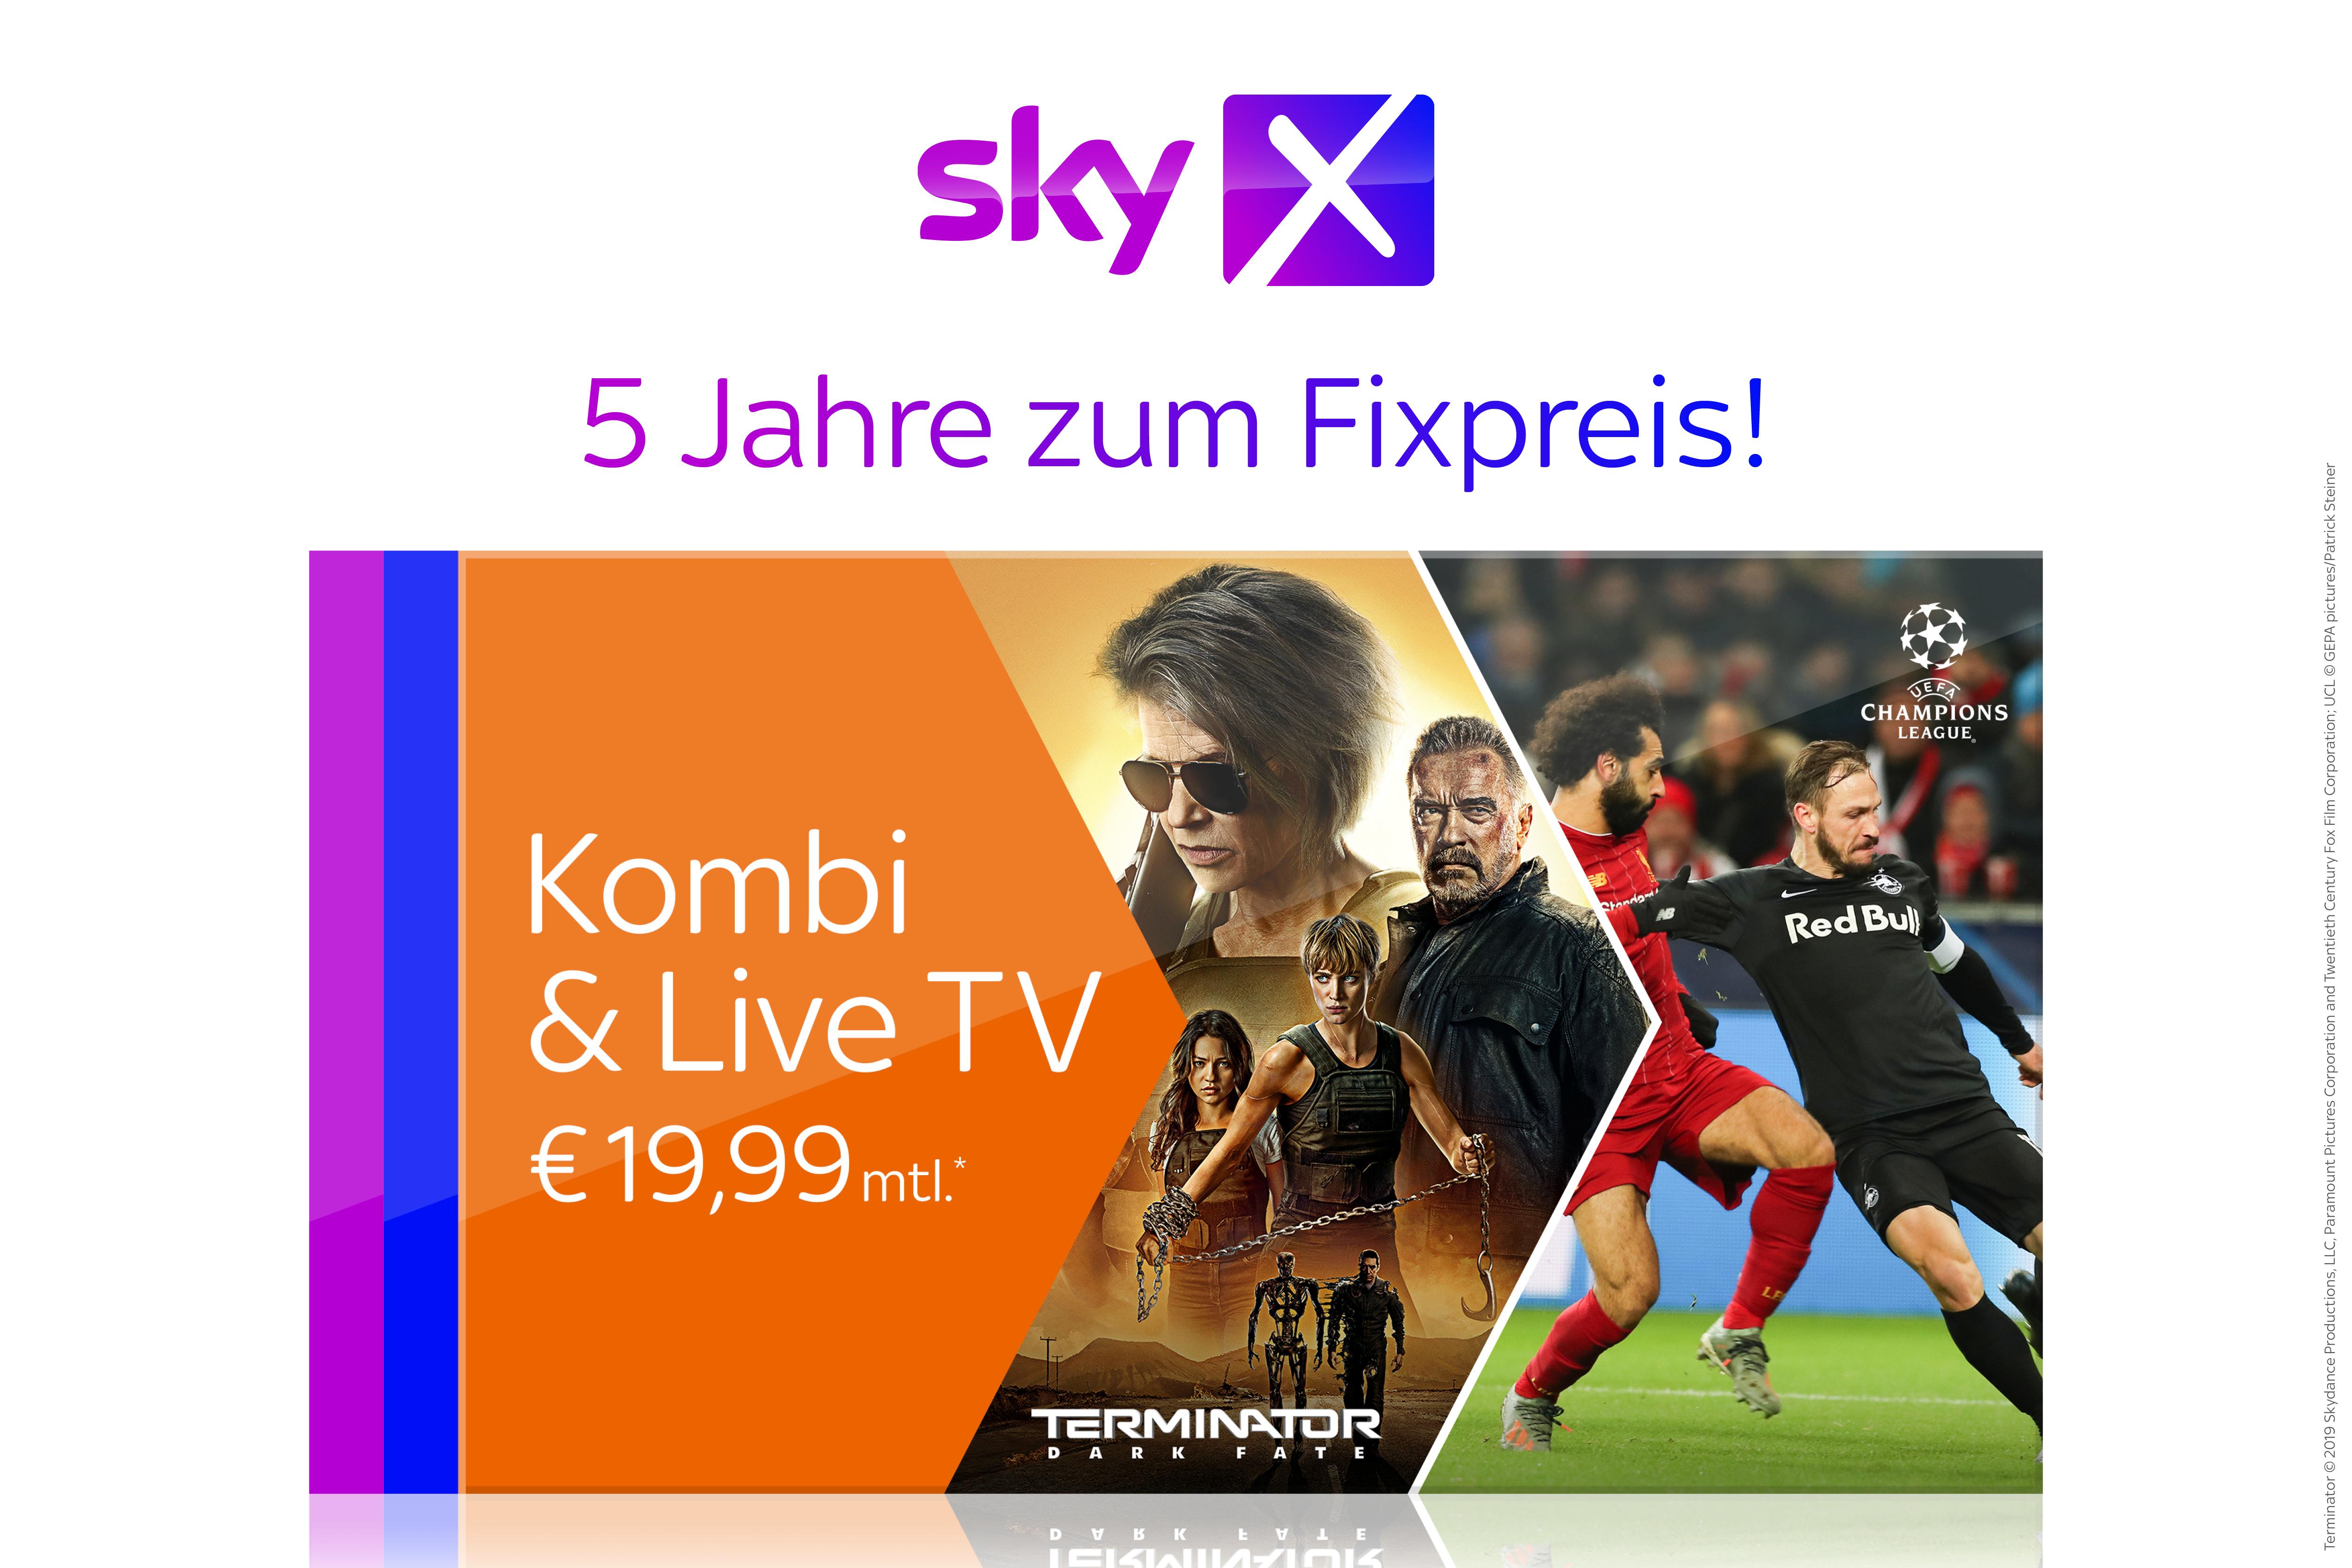 Sky X Kombi & Live TV fünf Jahre lang zum Fixpreis von € 19,99 statt 34,99 €